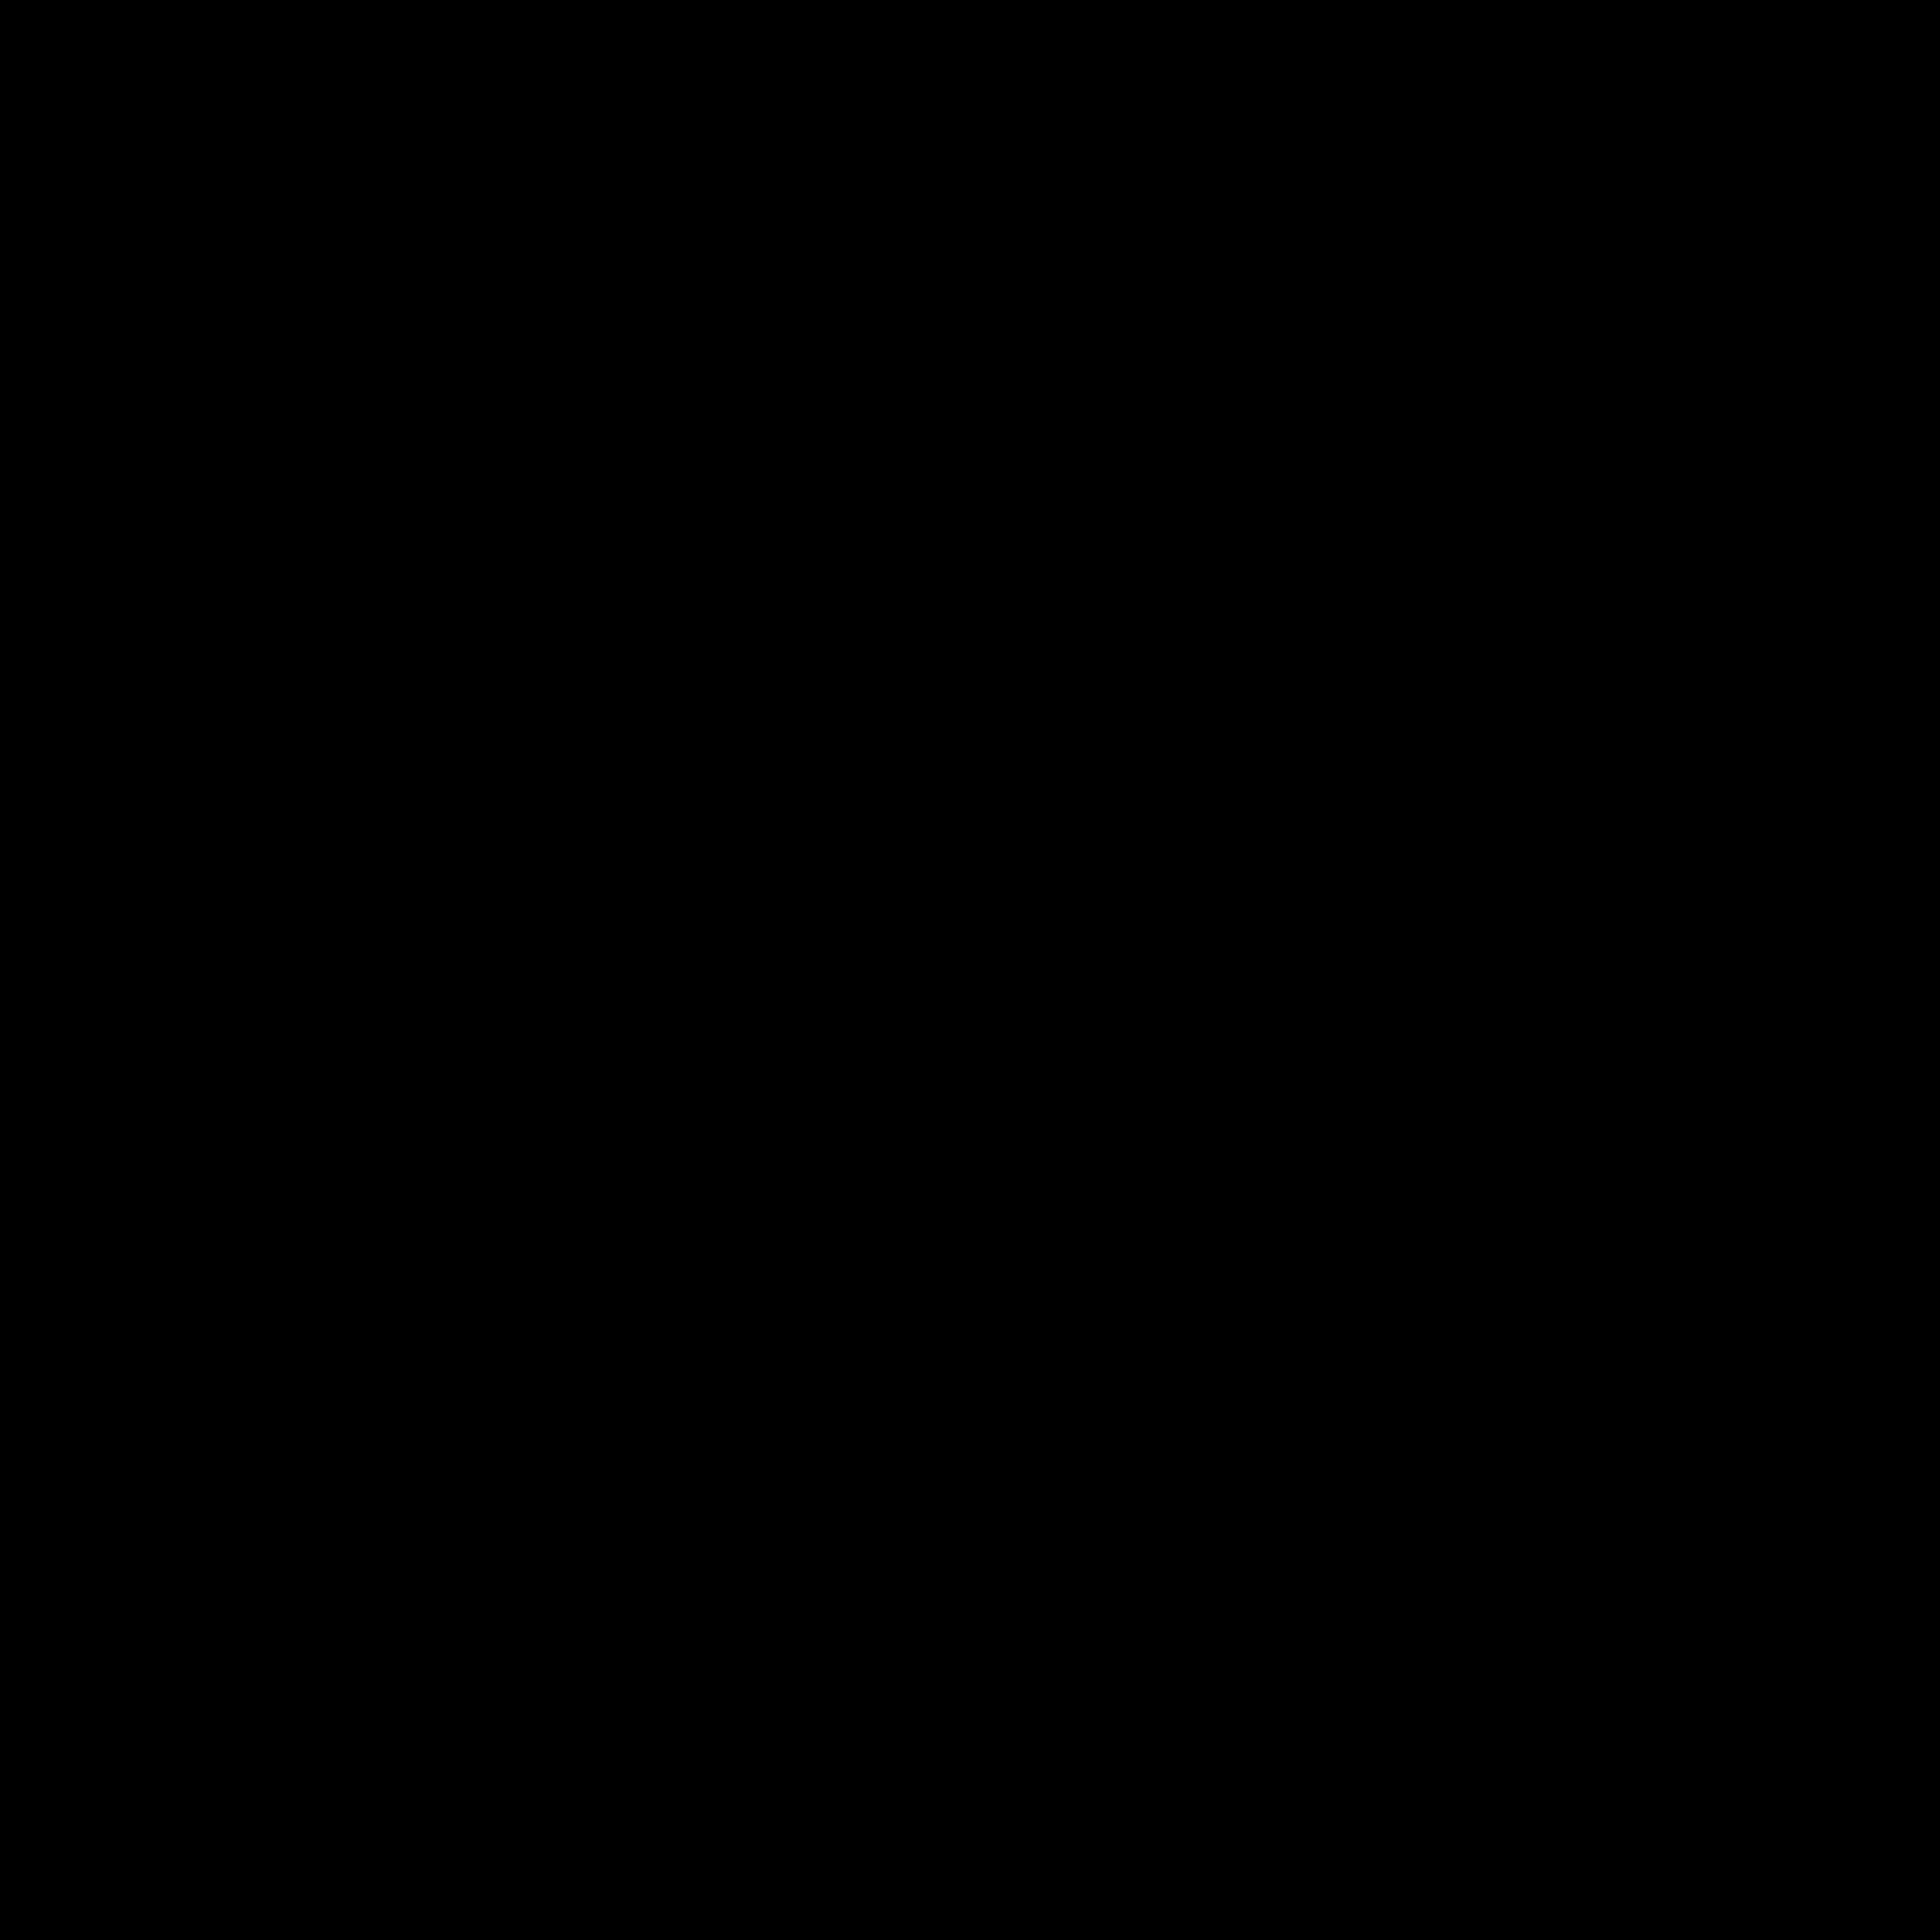 Peavey Logo PNG Transparent & SVG Vector - Freebie Supply